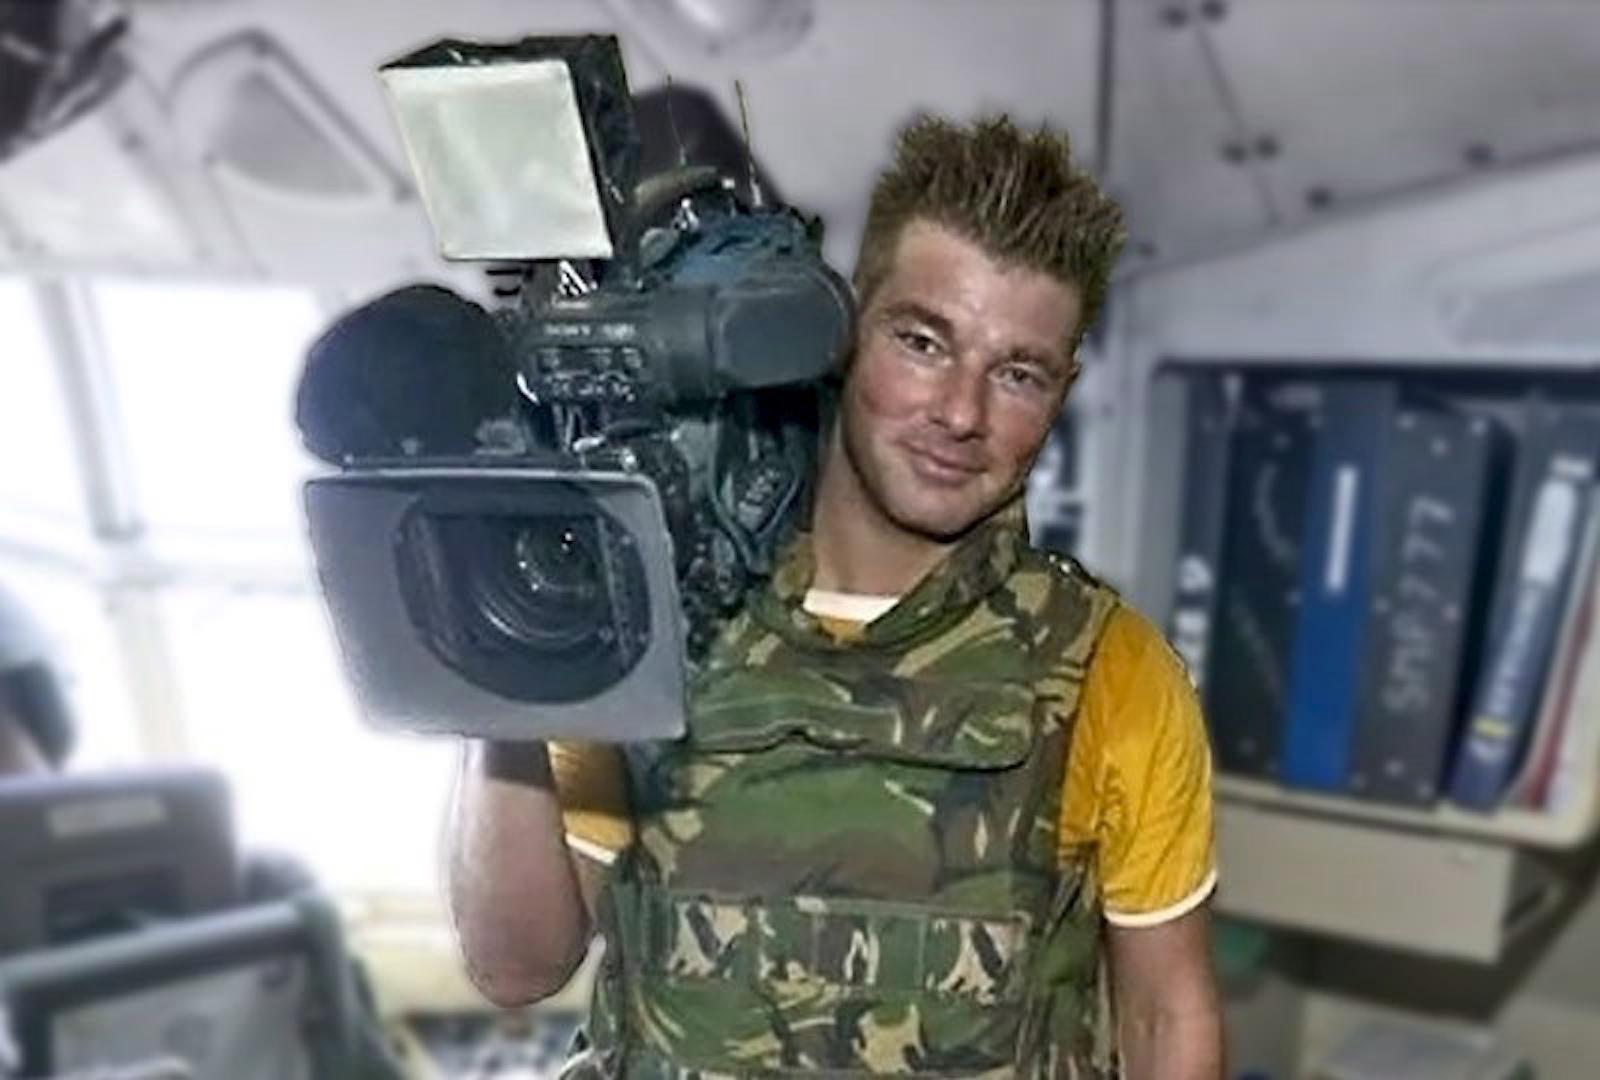 RTL-ის ოპერატორი სტენ სტორიმანსი დაიღუპა გორის დაბომბვის დროს EPA/COMM RTL